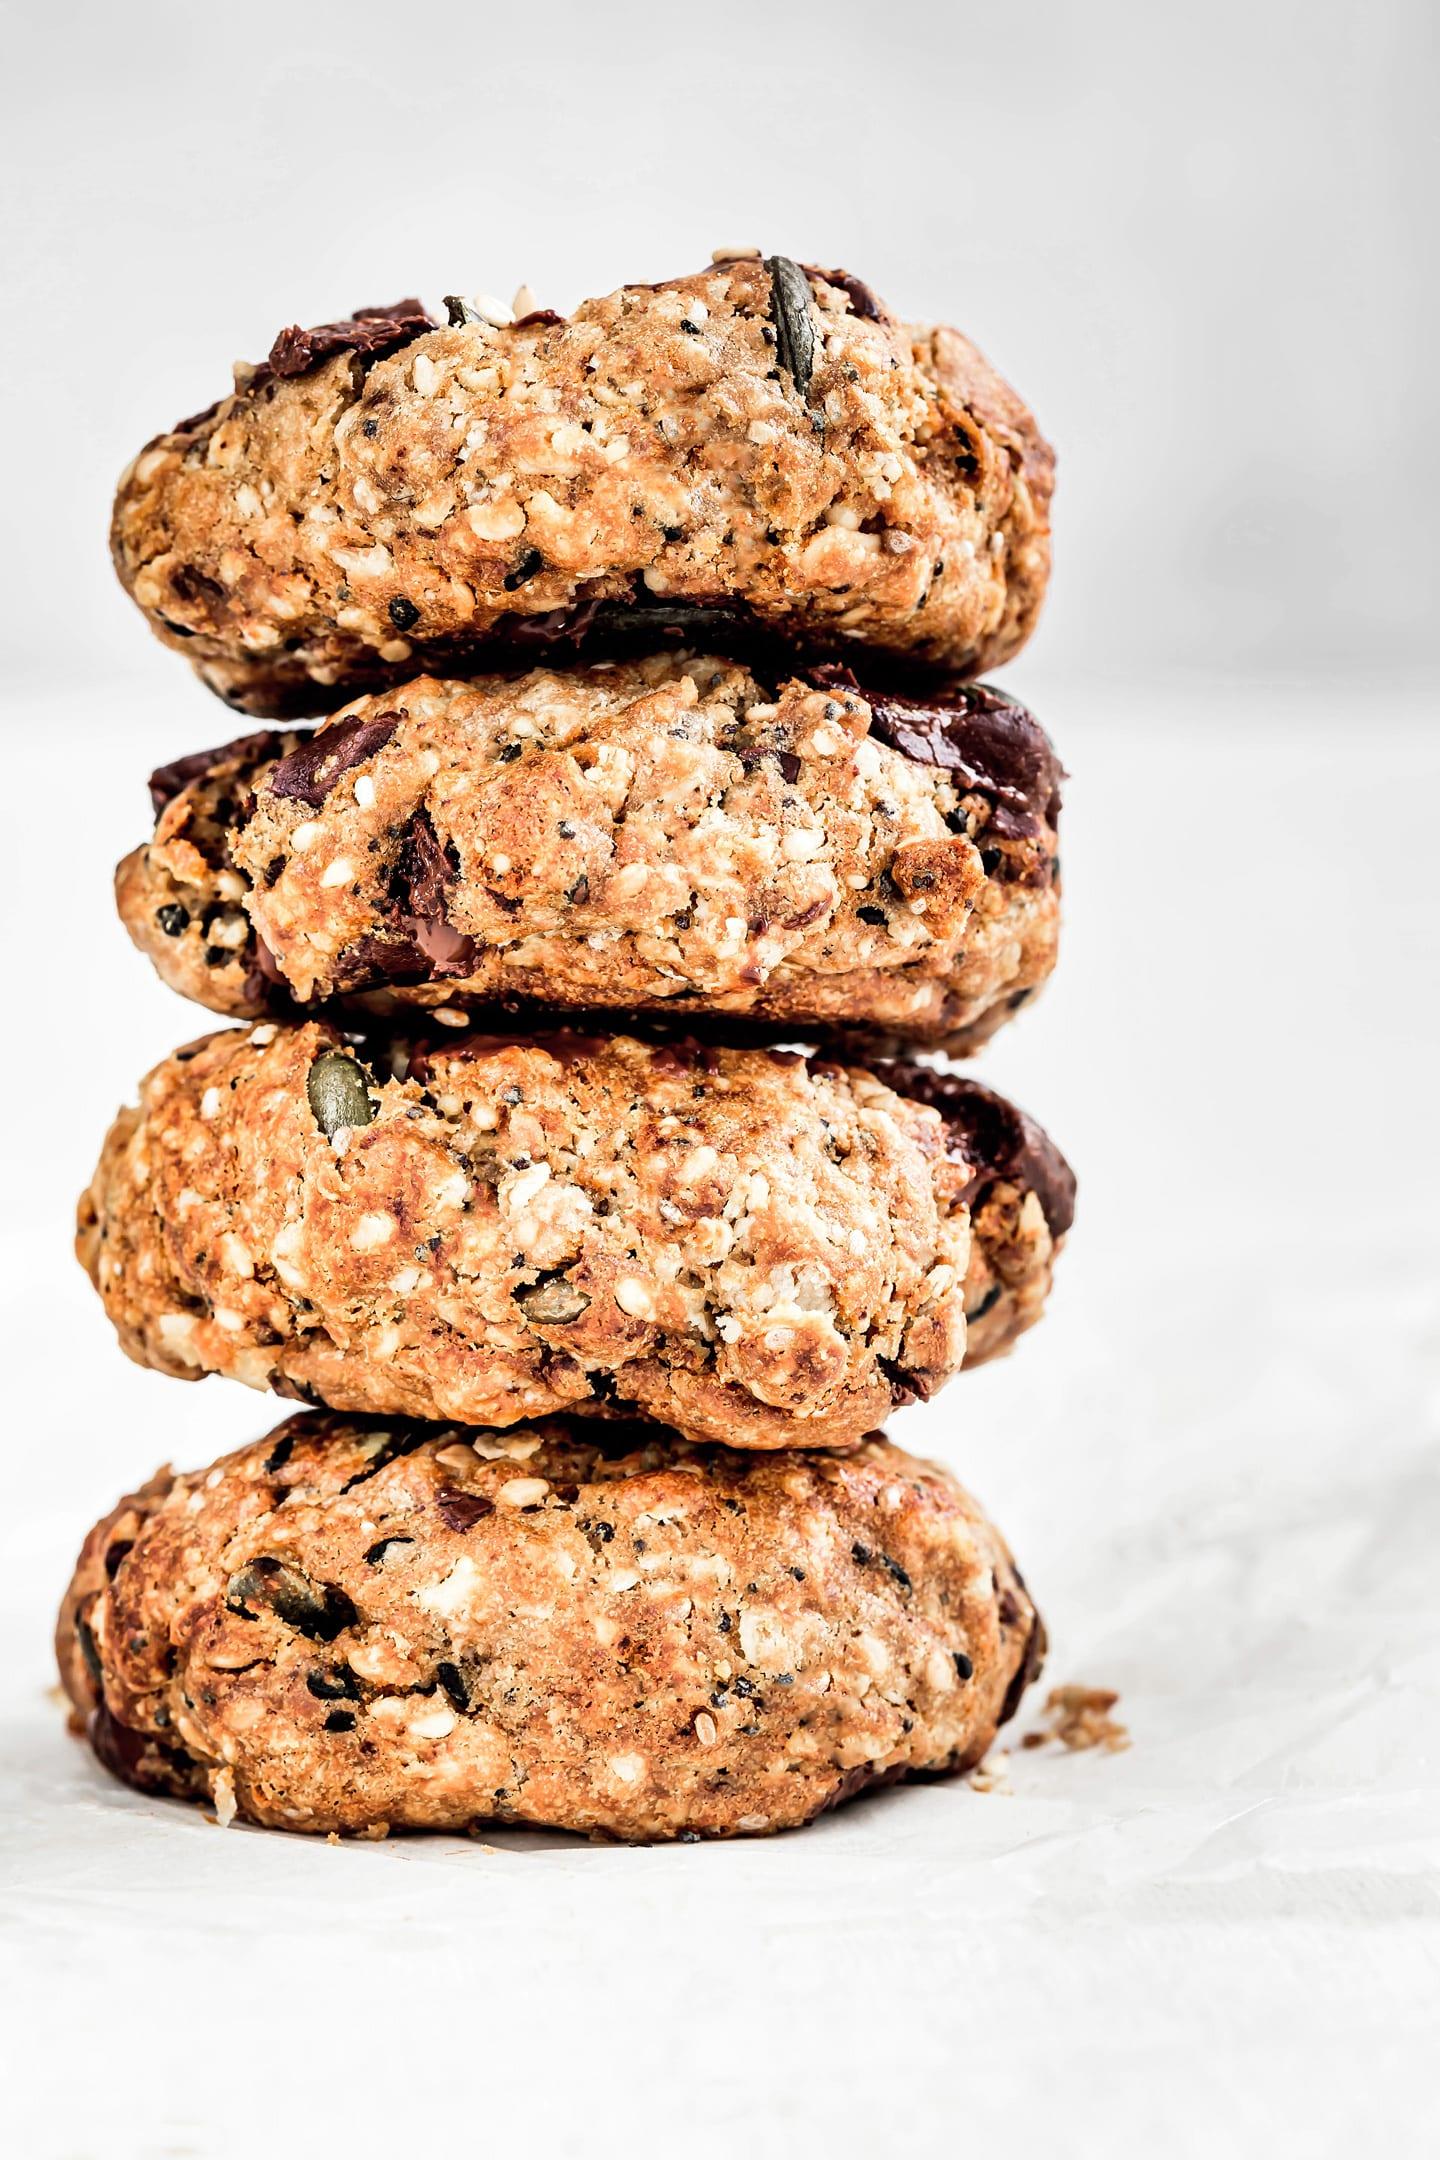 Cookies gourmands aux graines